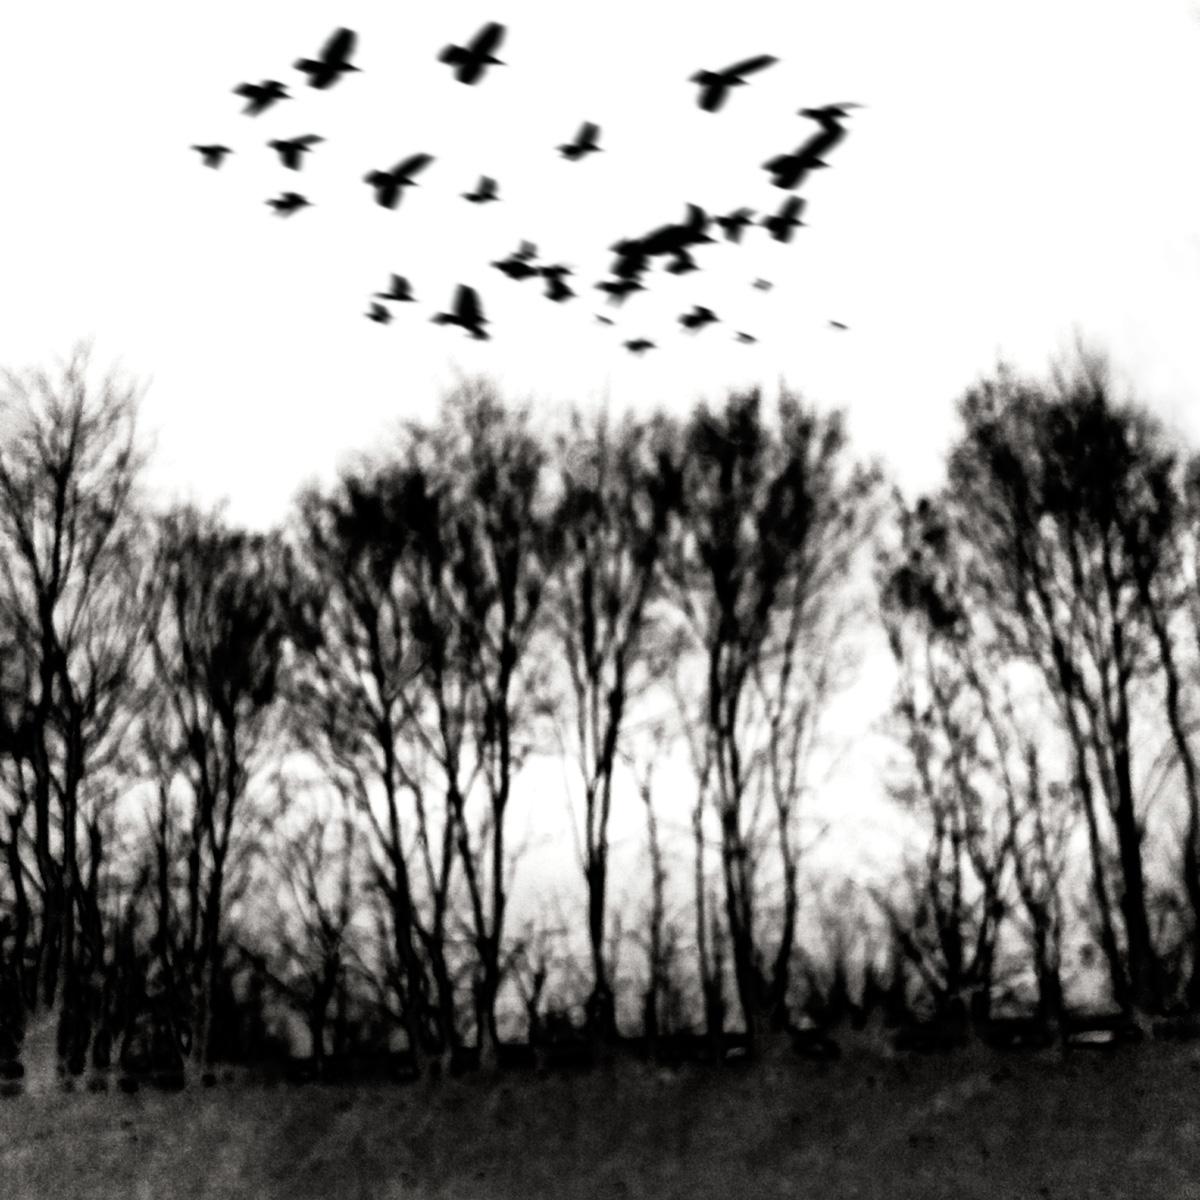 Bäume im Nebel 17.1